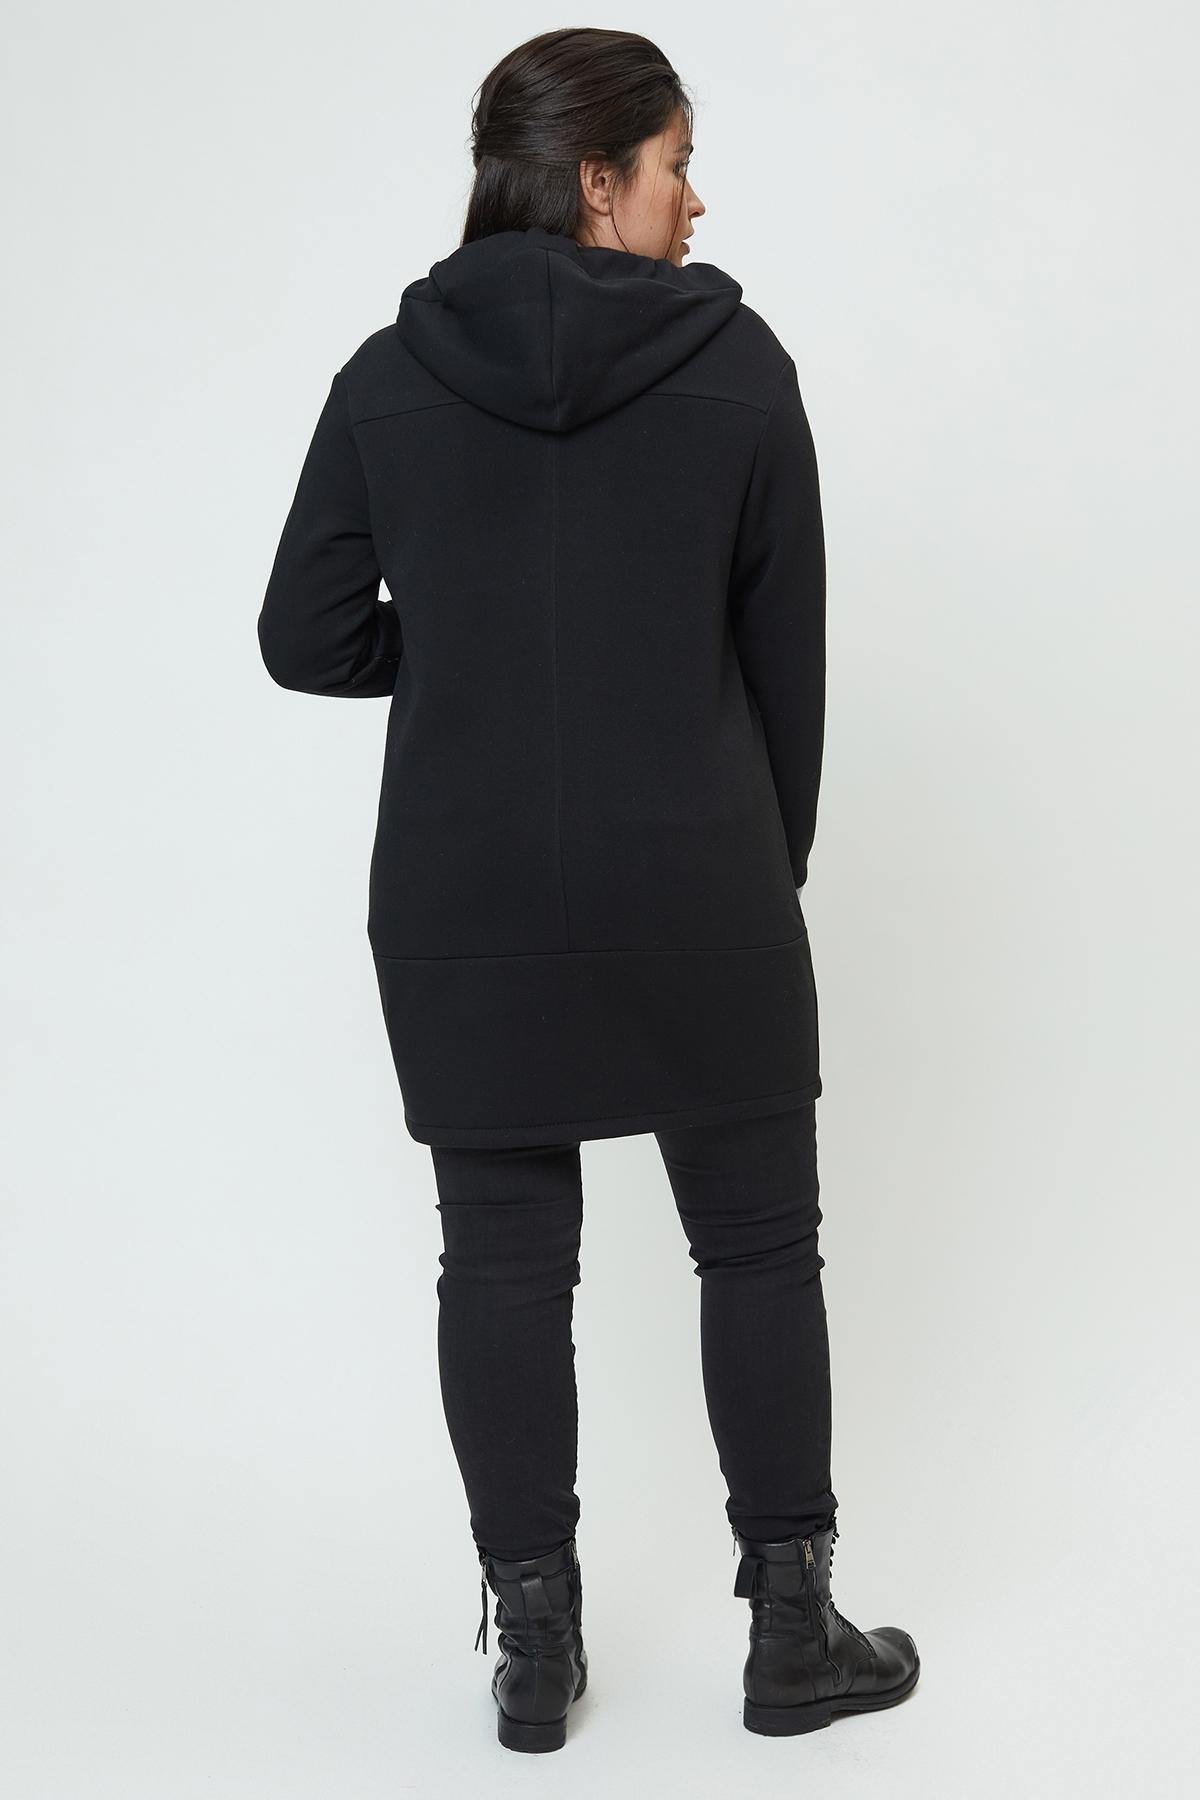 Кардиган Вангелія (чорний)